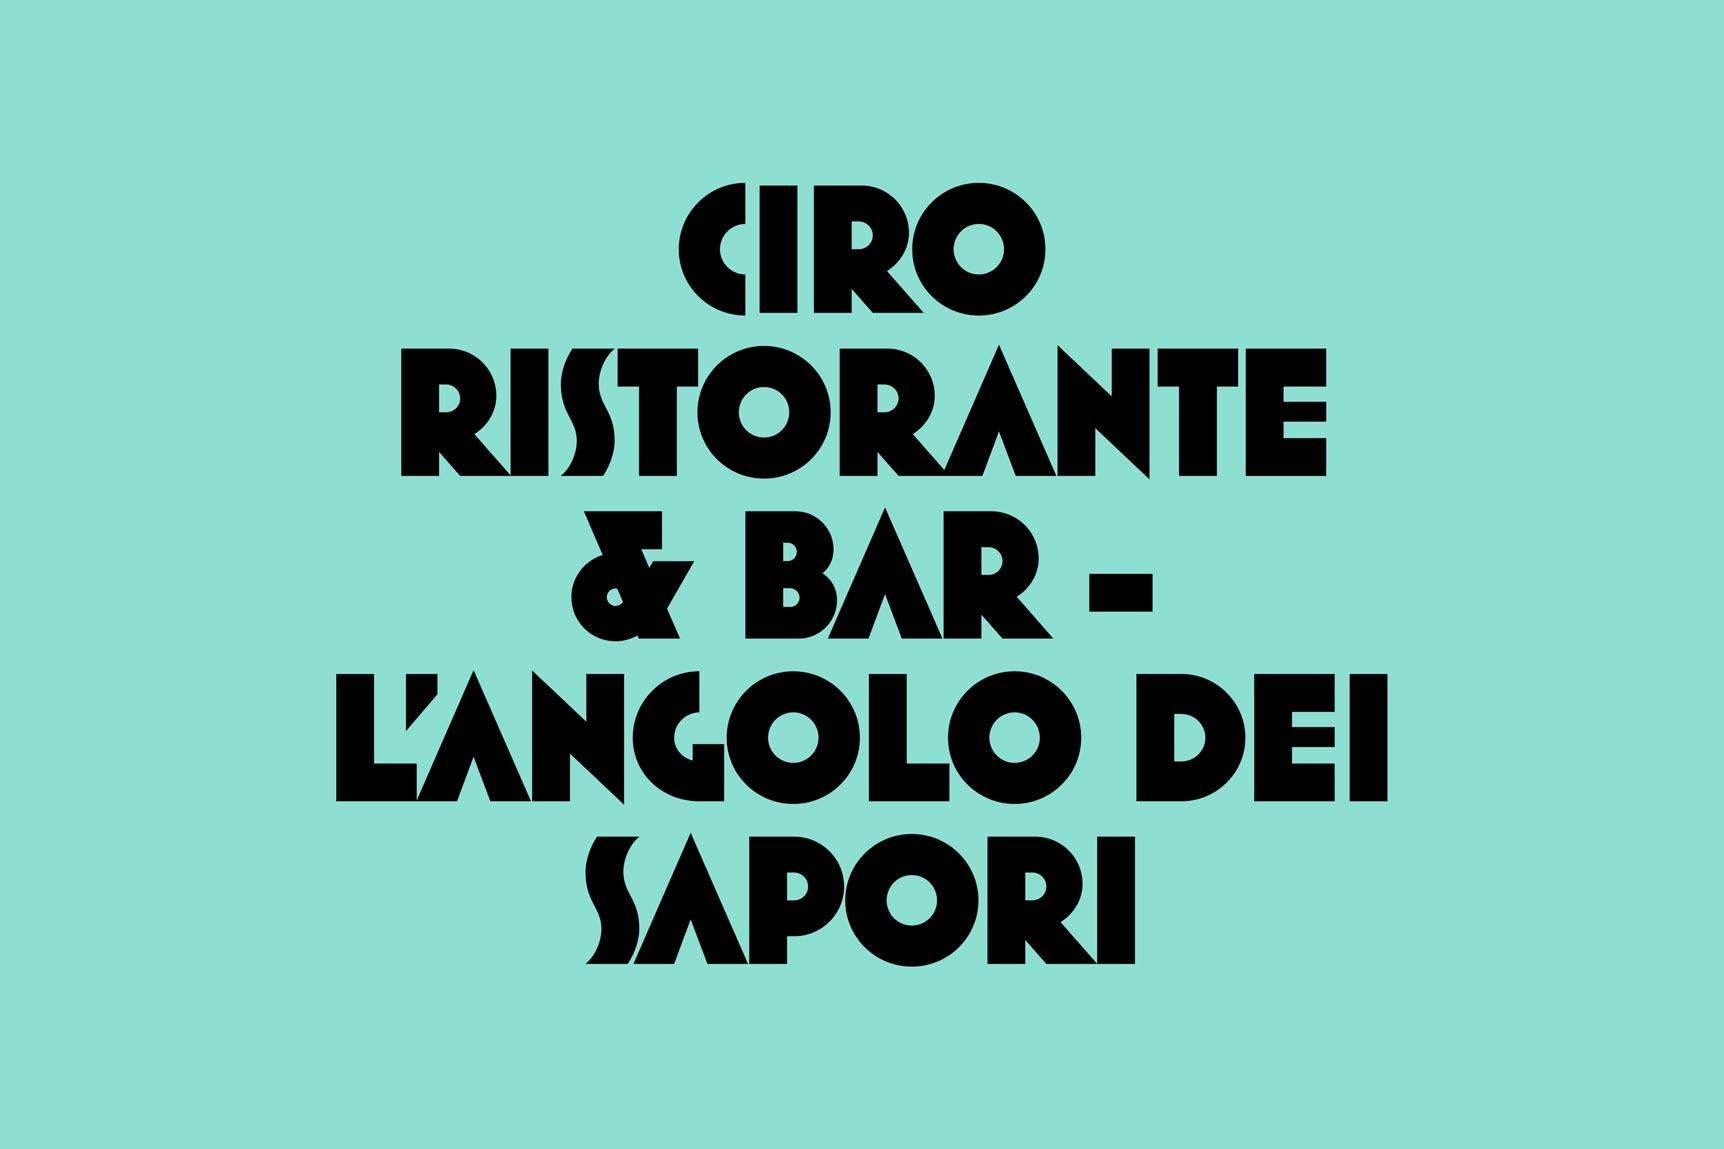 Ciro - Typografi 2